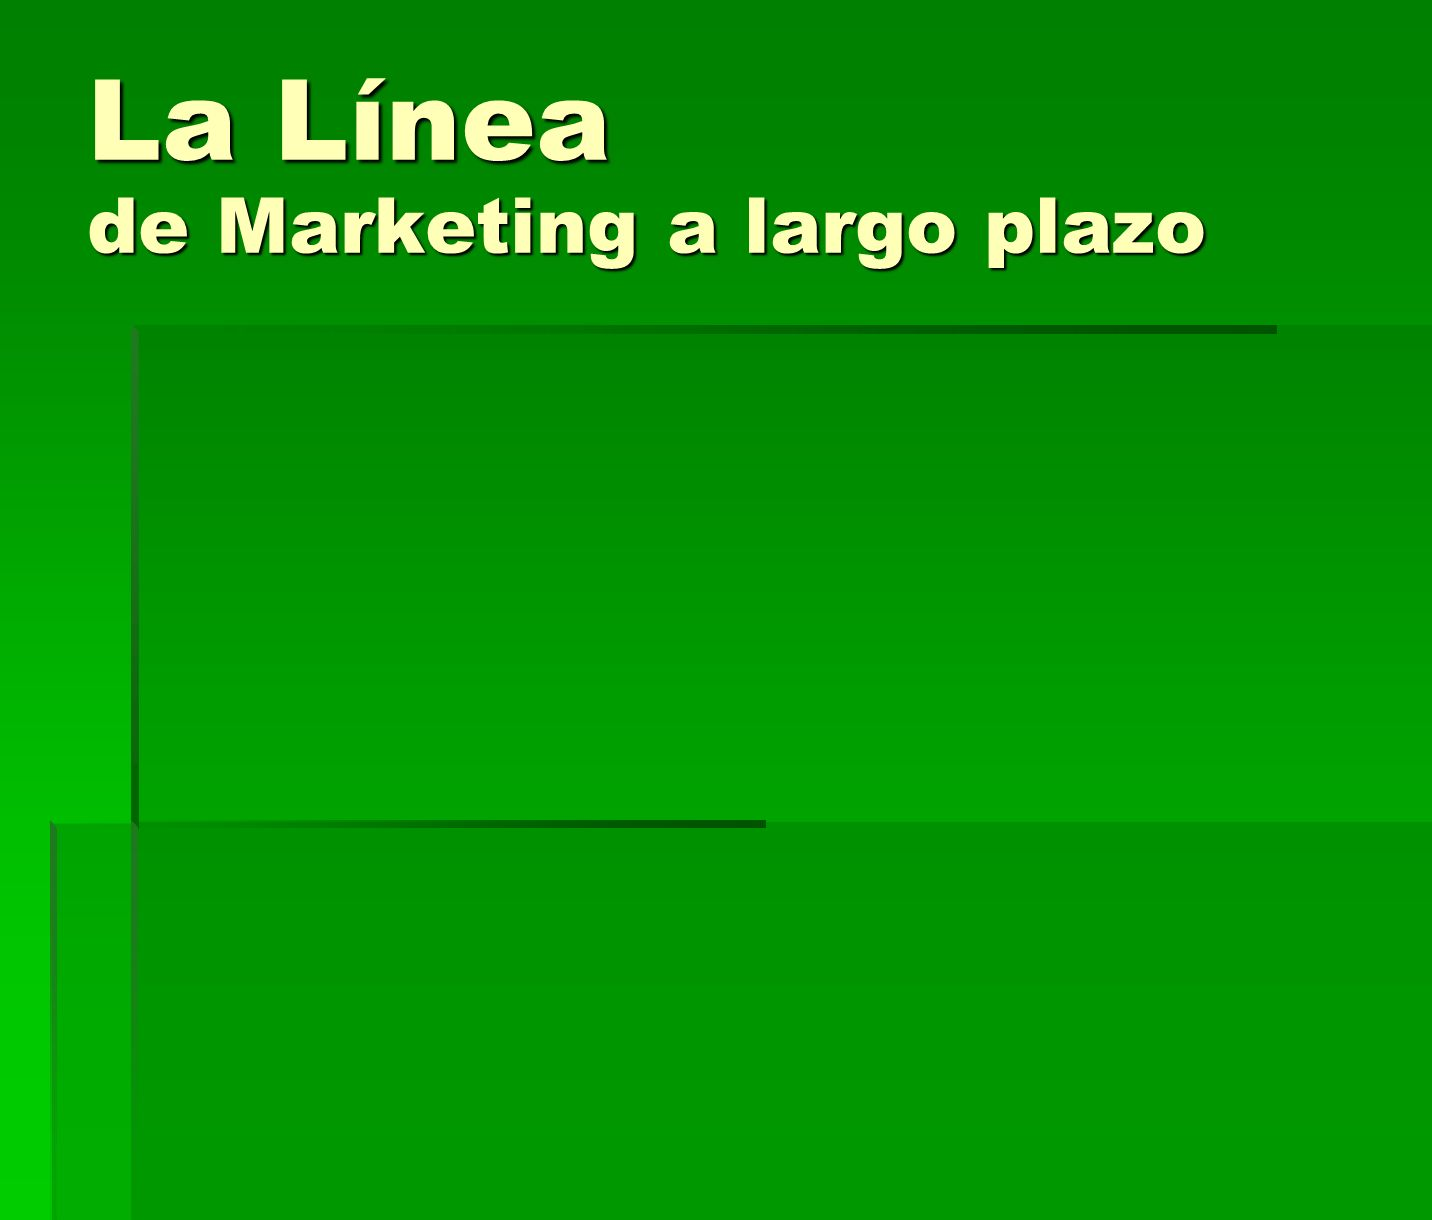 La Línea de Marketing a largo plazo